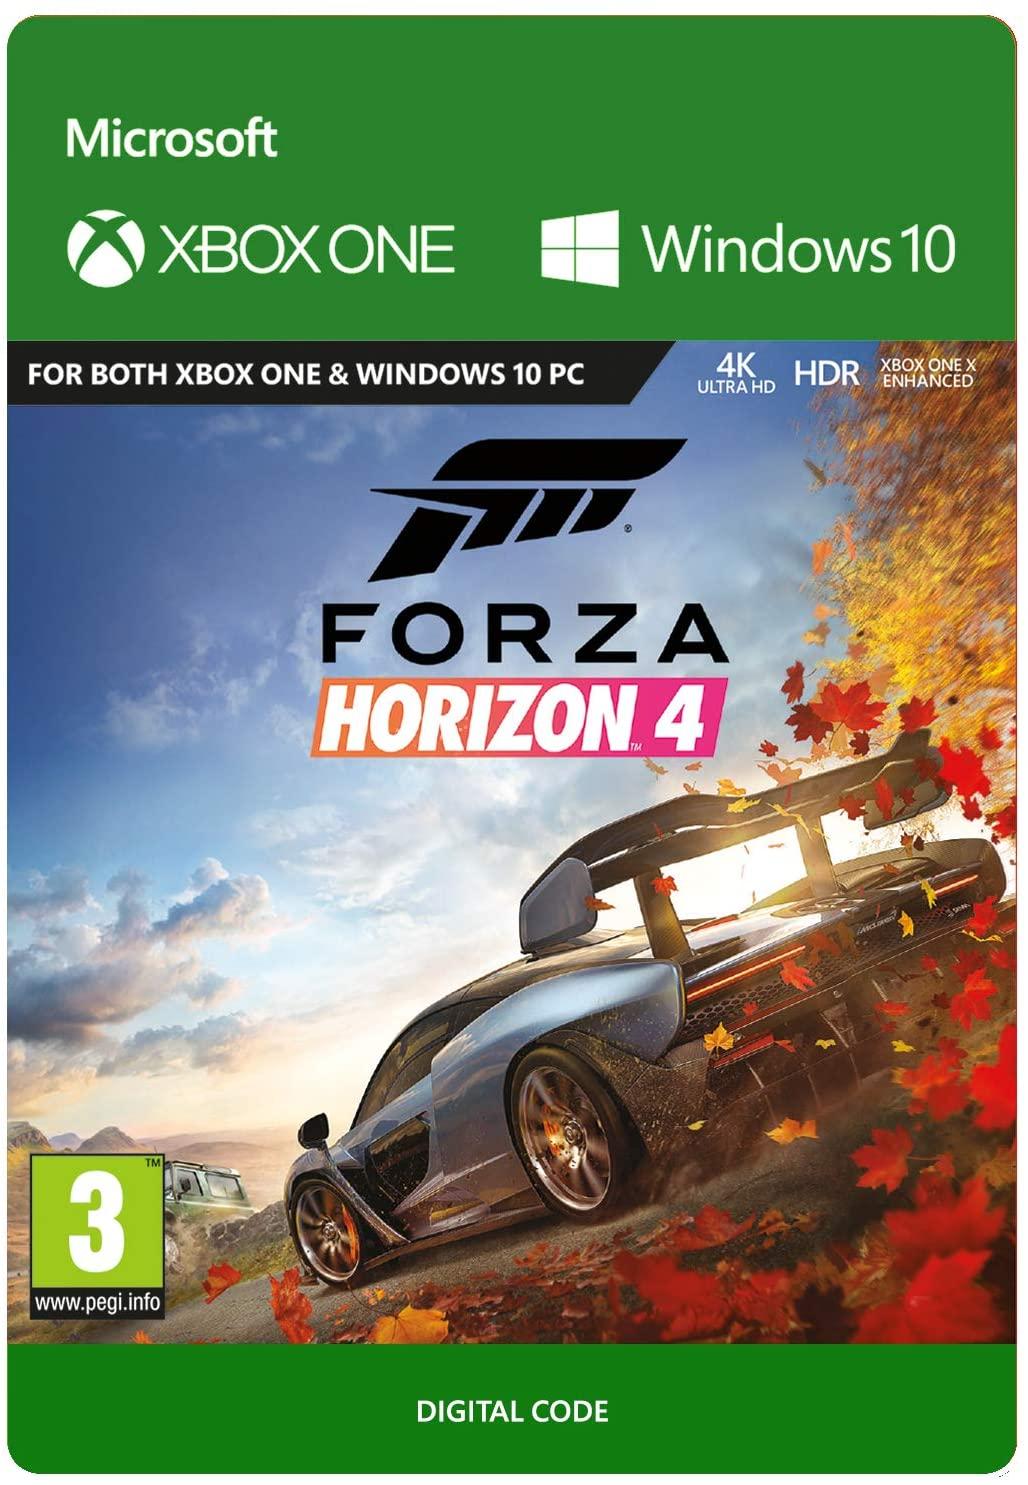 Forza Horizon 4 Xbox One & PC Download Code - £12.49 @ Amazon (Prime Members Only)